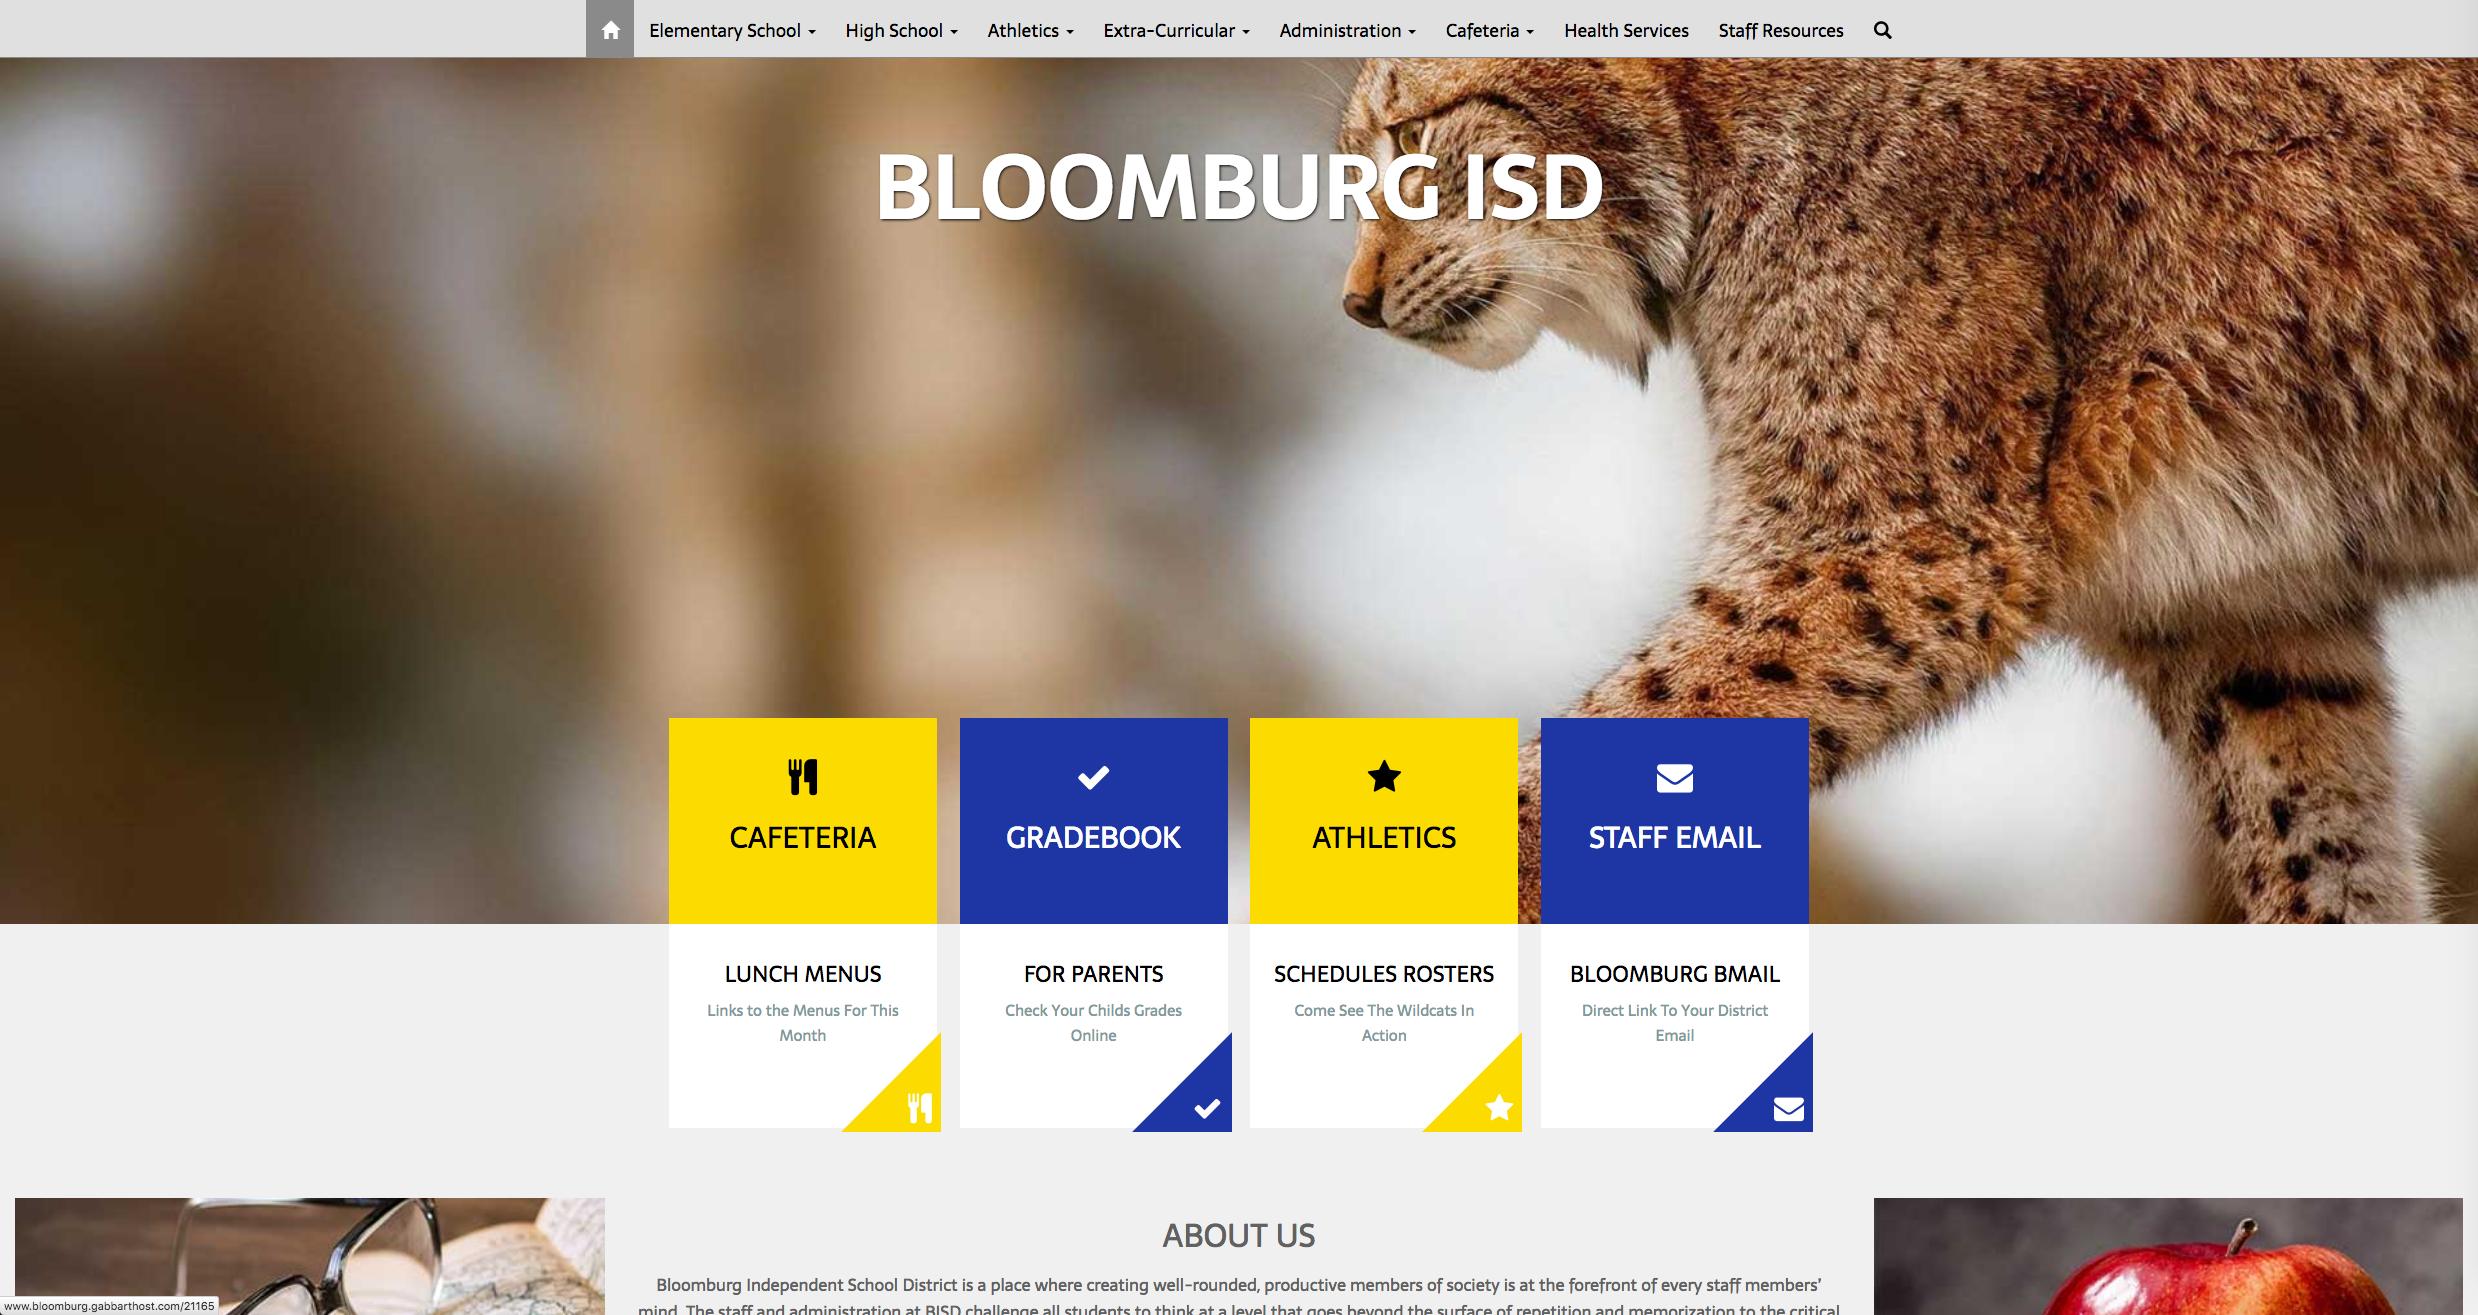 Bloomburg ISD